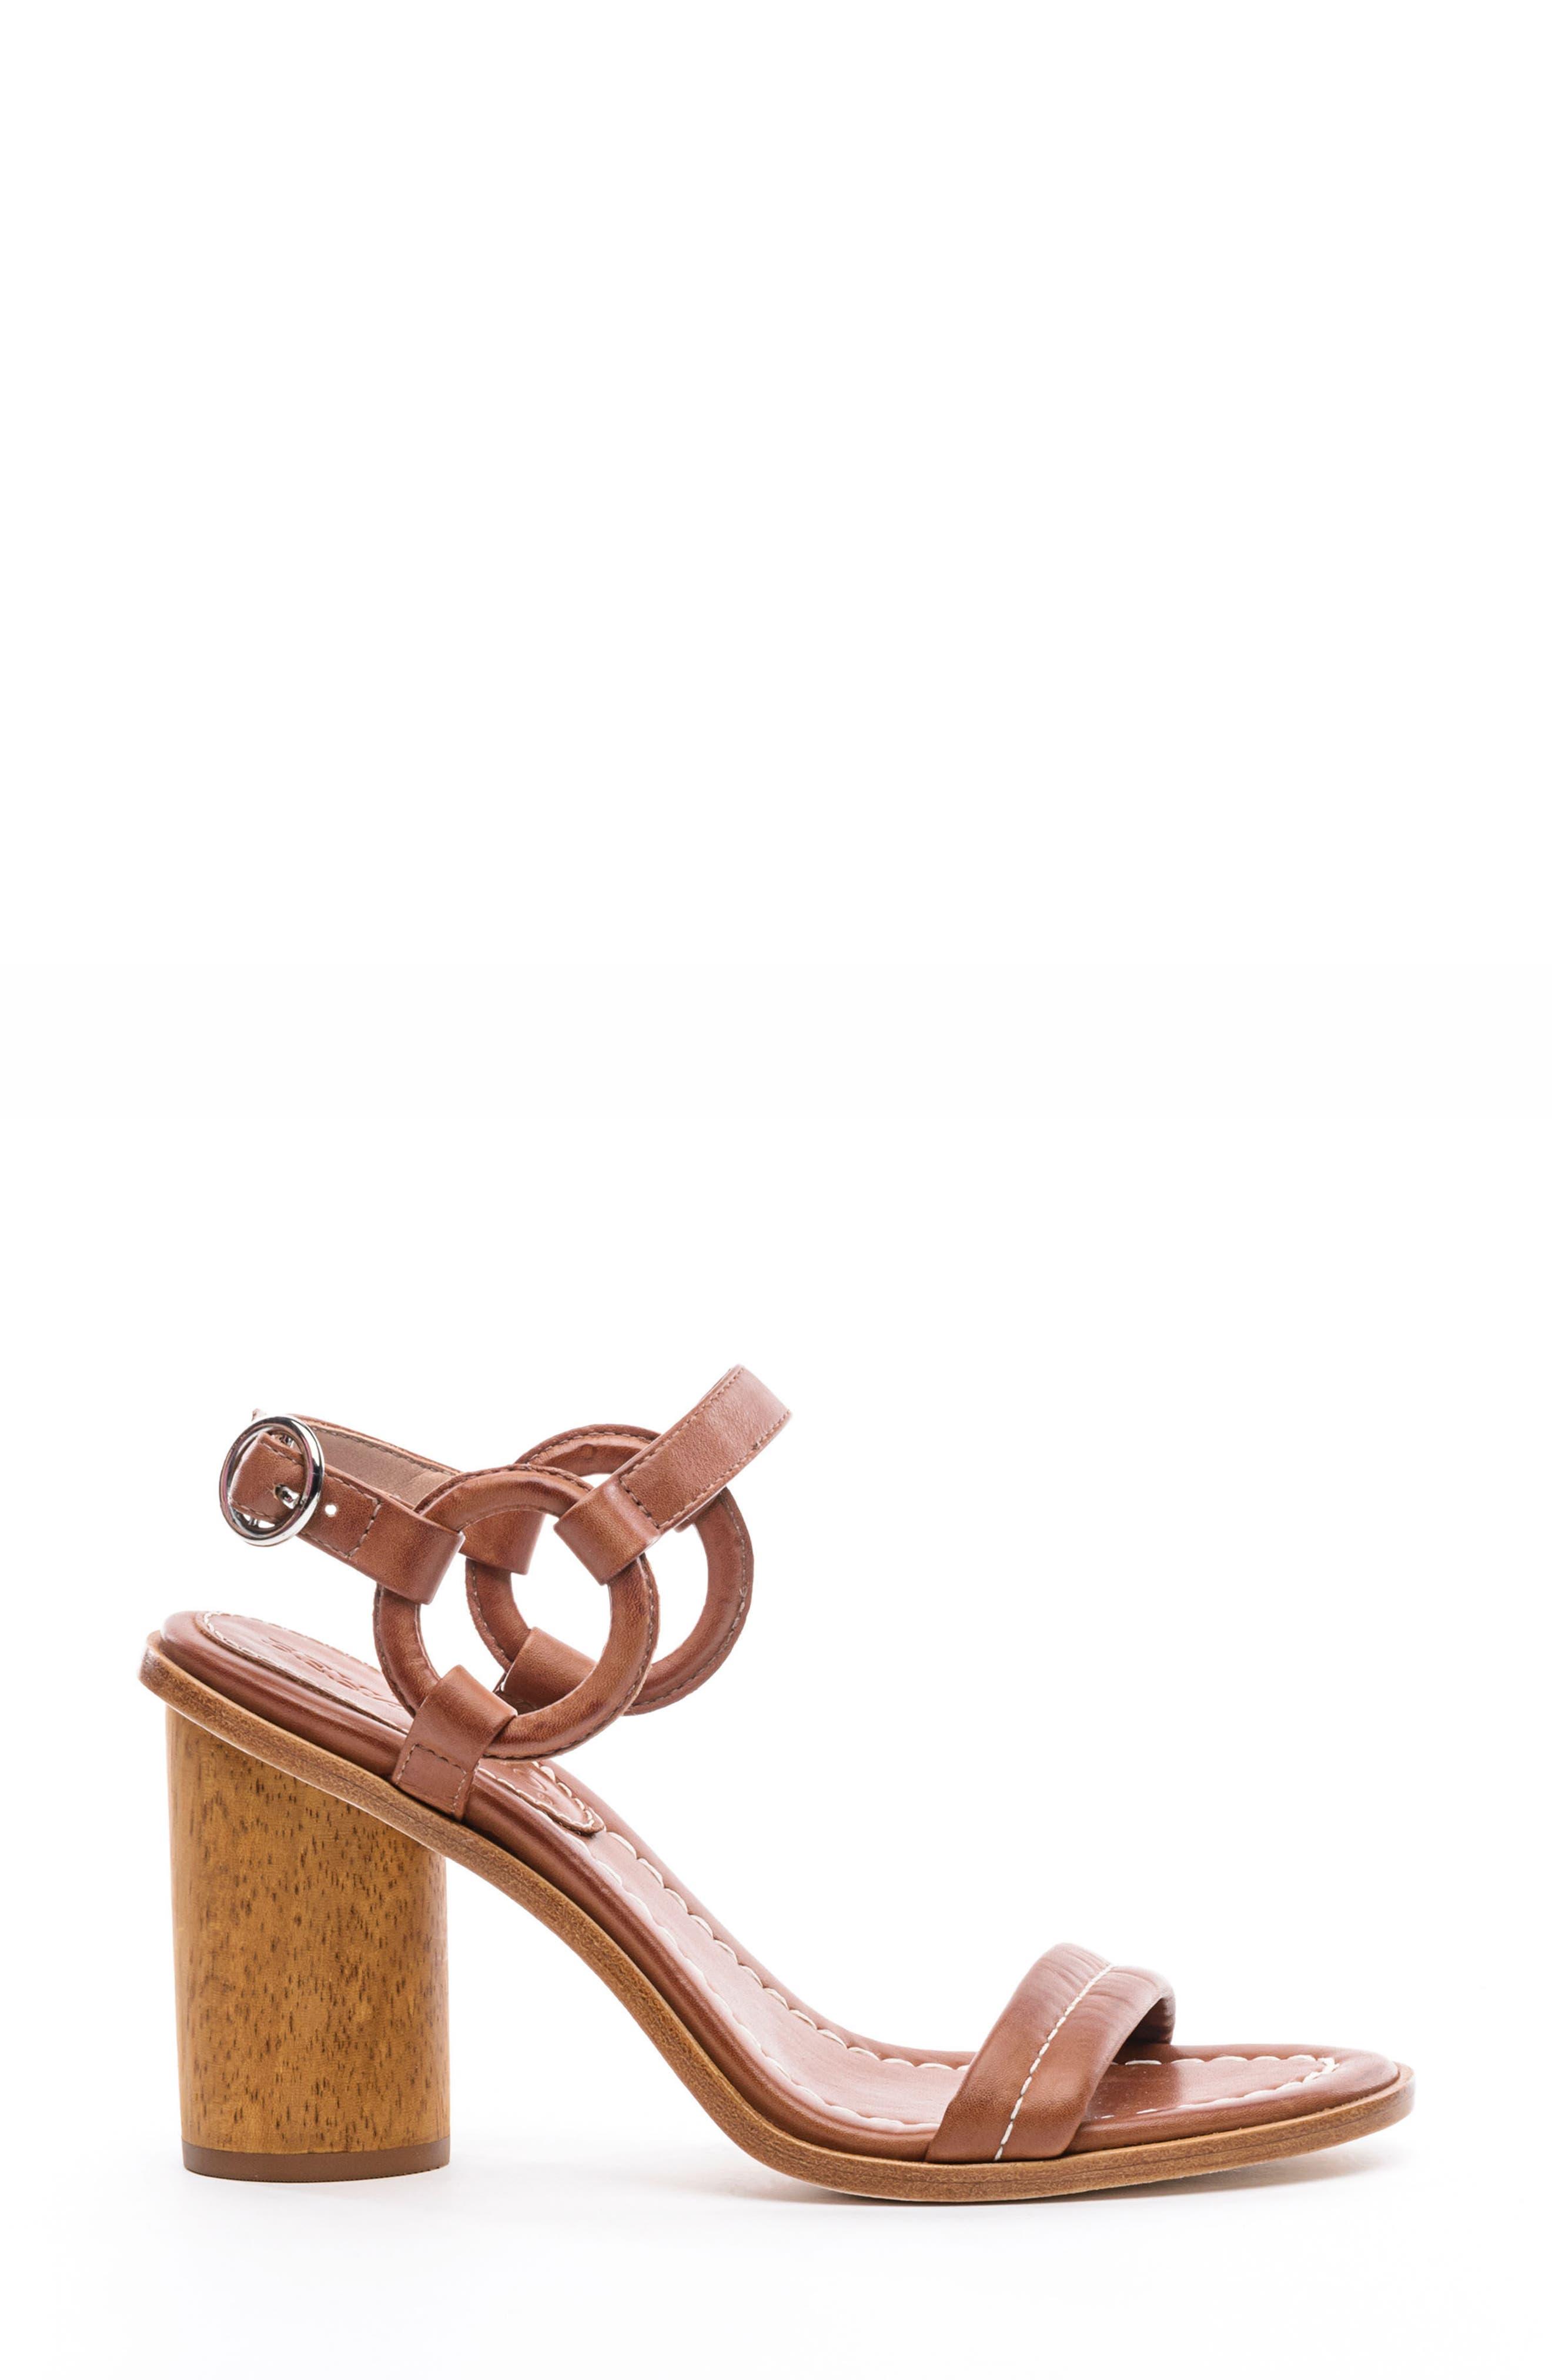 BERNARDO, Harlow Ankle Strap Sandal, Alternate thumbnail 3, color, LUGGAGE LEATHER